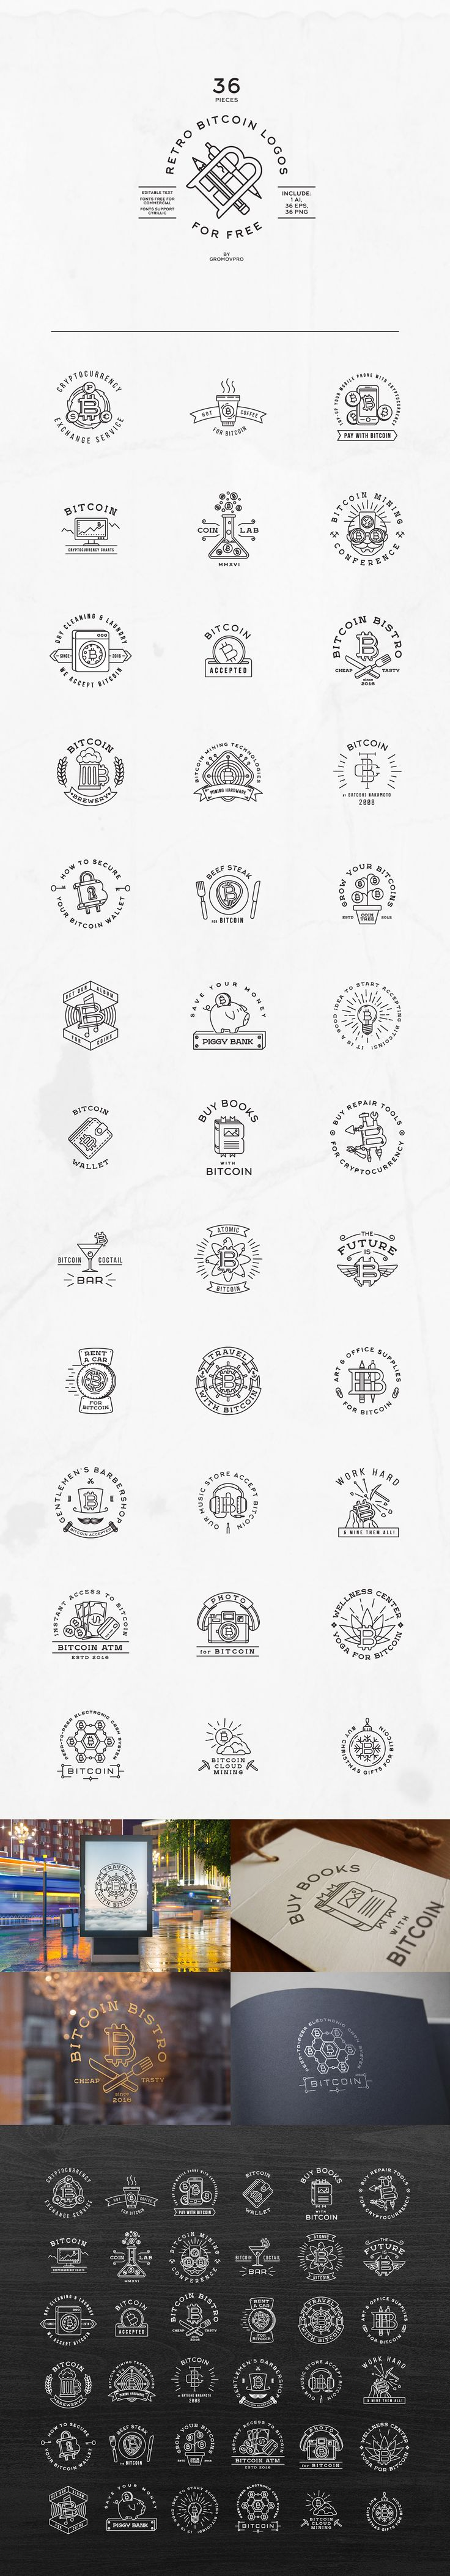 36 Retro Bitcoin Logos (FREE TEMPLATES) on Behance